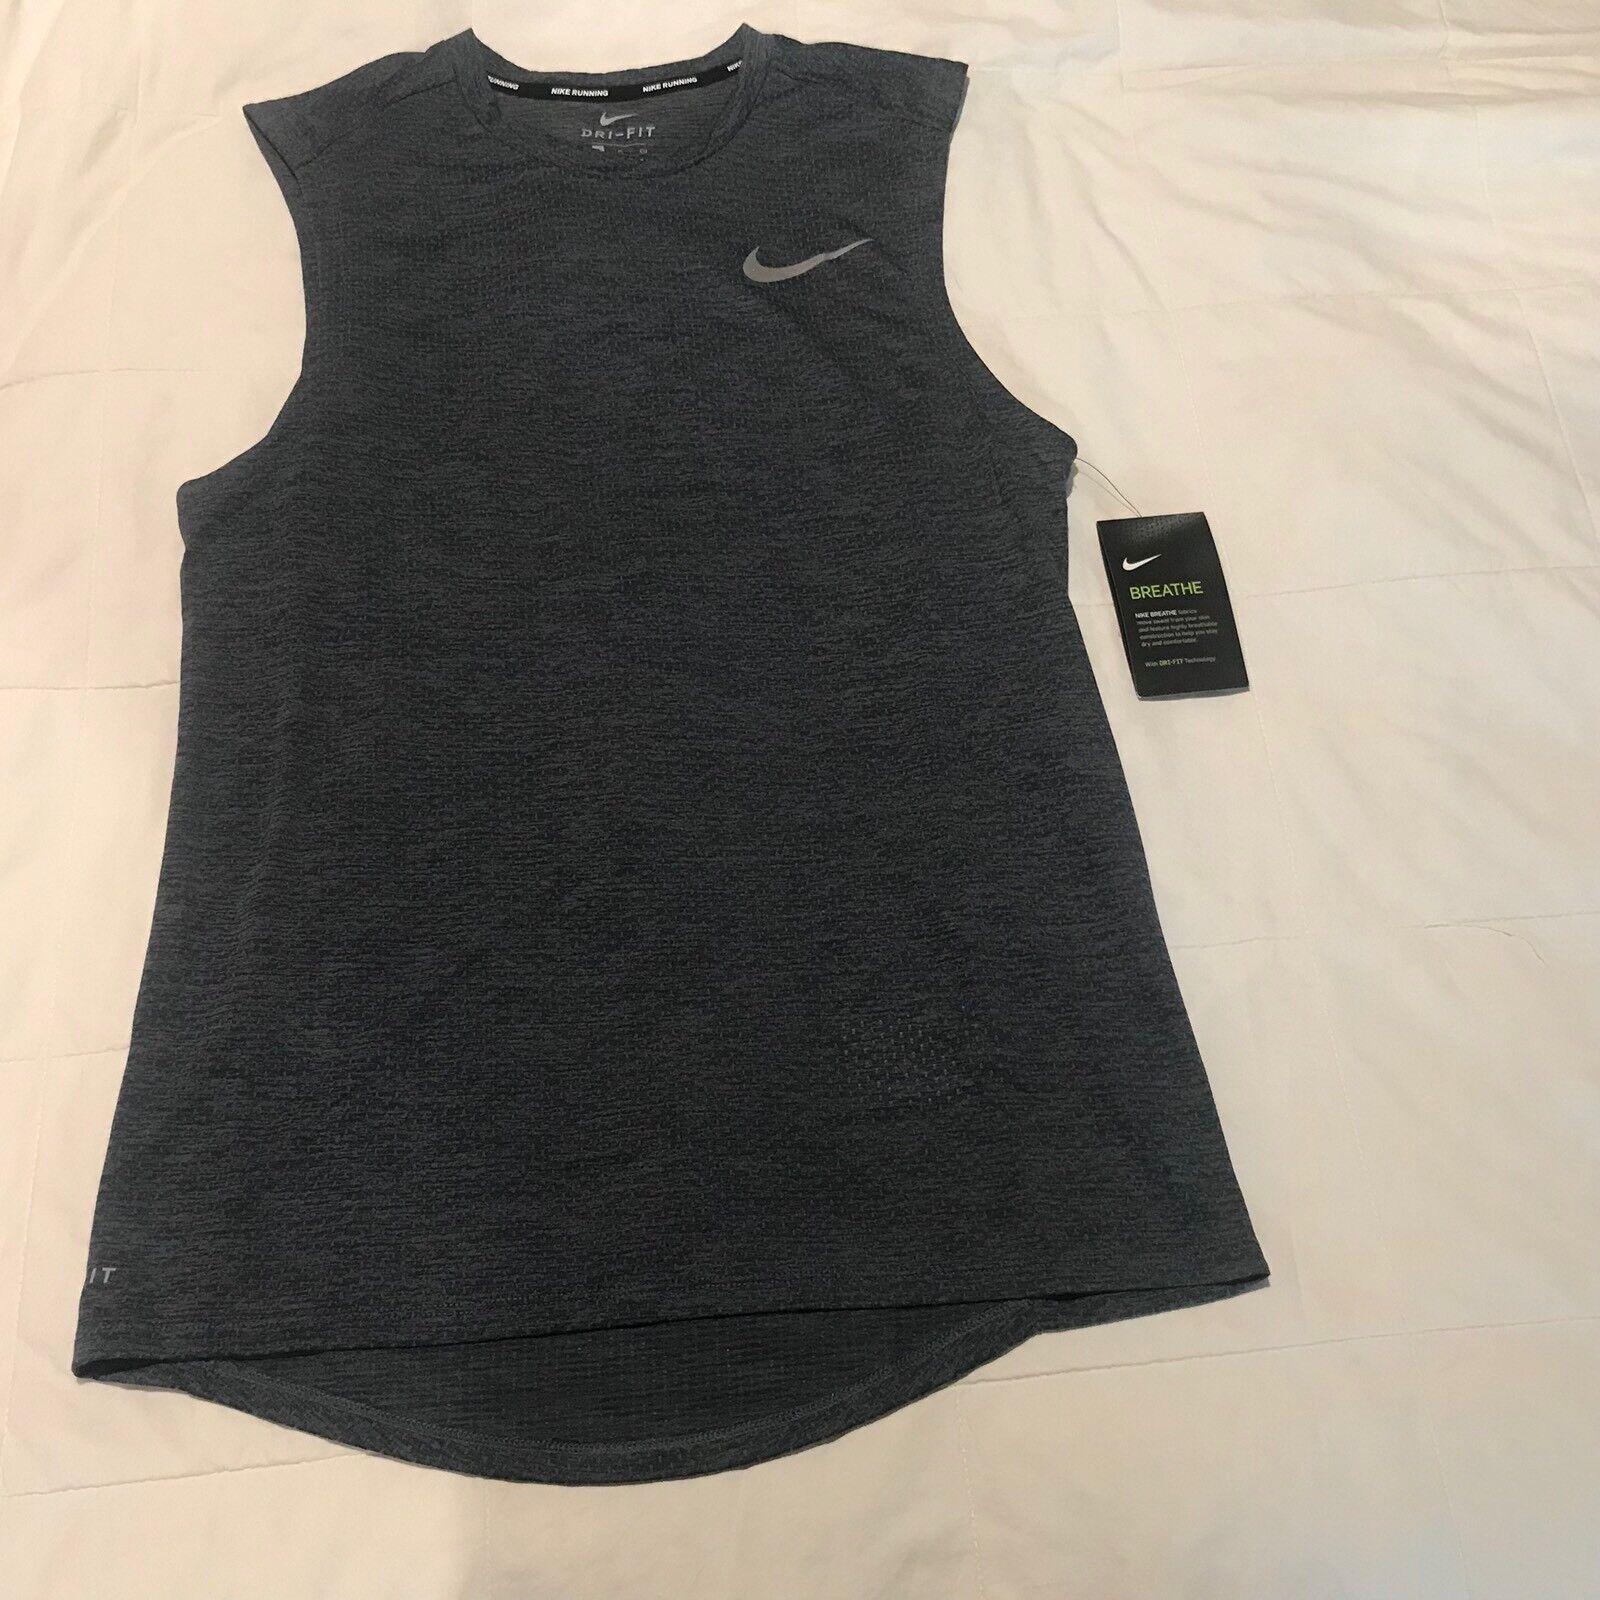 Nike Hombre Respirar L Atletismo Azul Marino Camiseta de Tirantes Tirantes  Tirantes Camisa Grande 1a19ff 3236f22206683